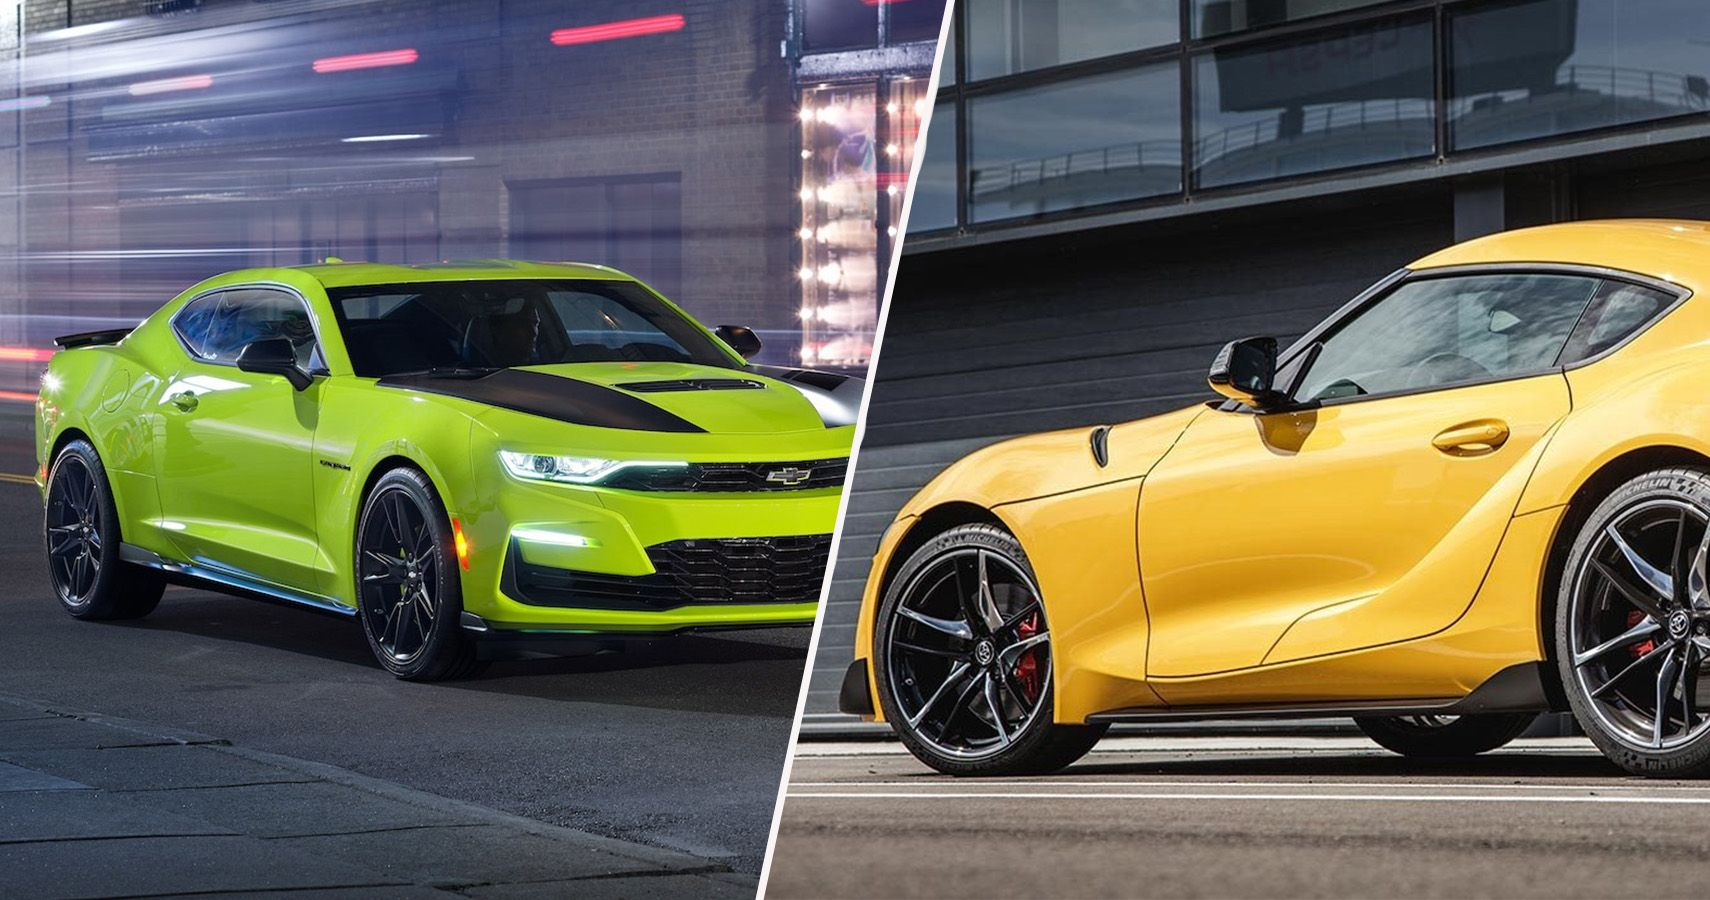 10 Most Unique Car Colors For 2020 | HotCars